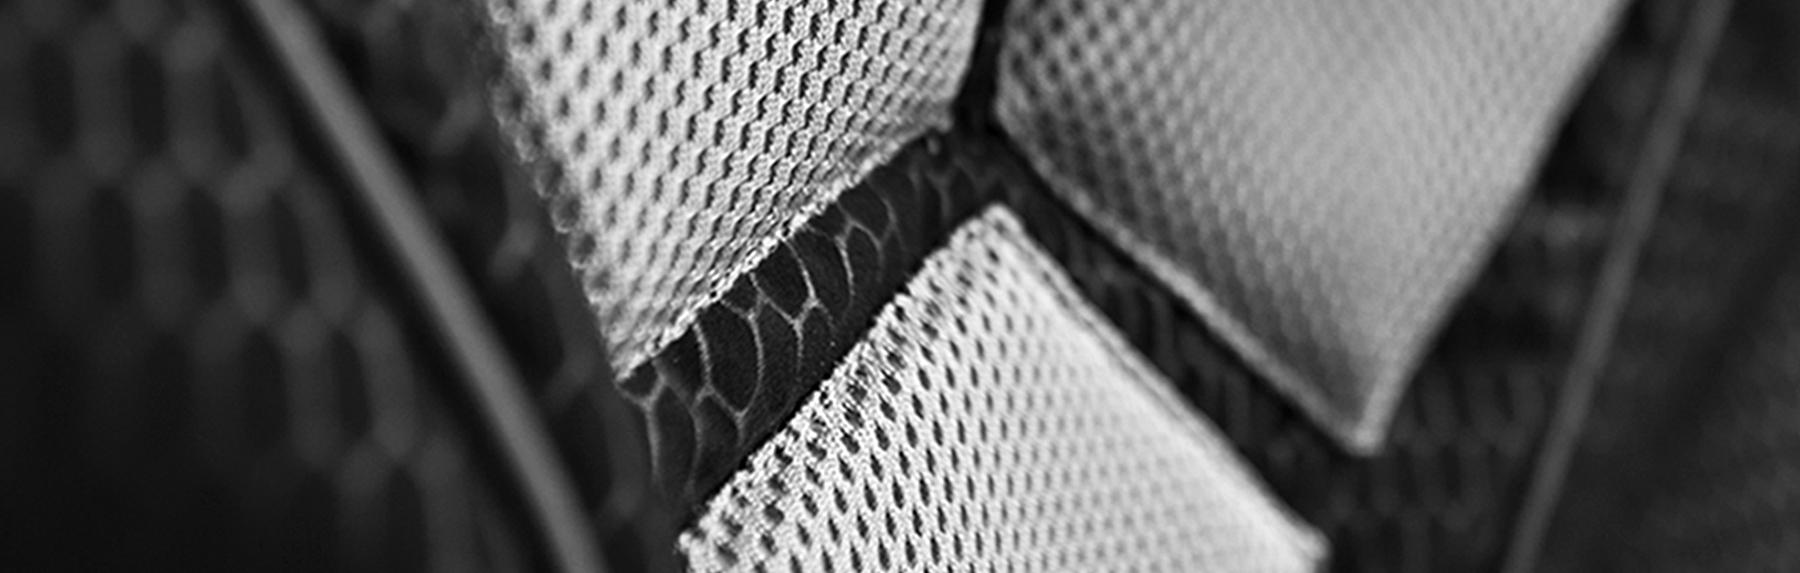 Obermeyer interior mesh inserts